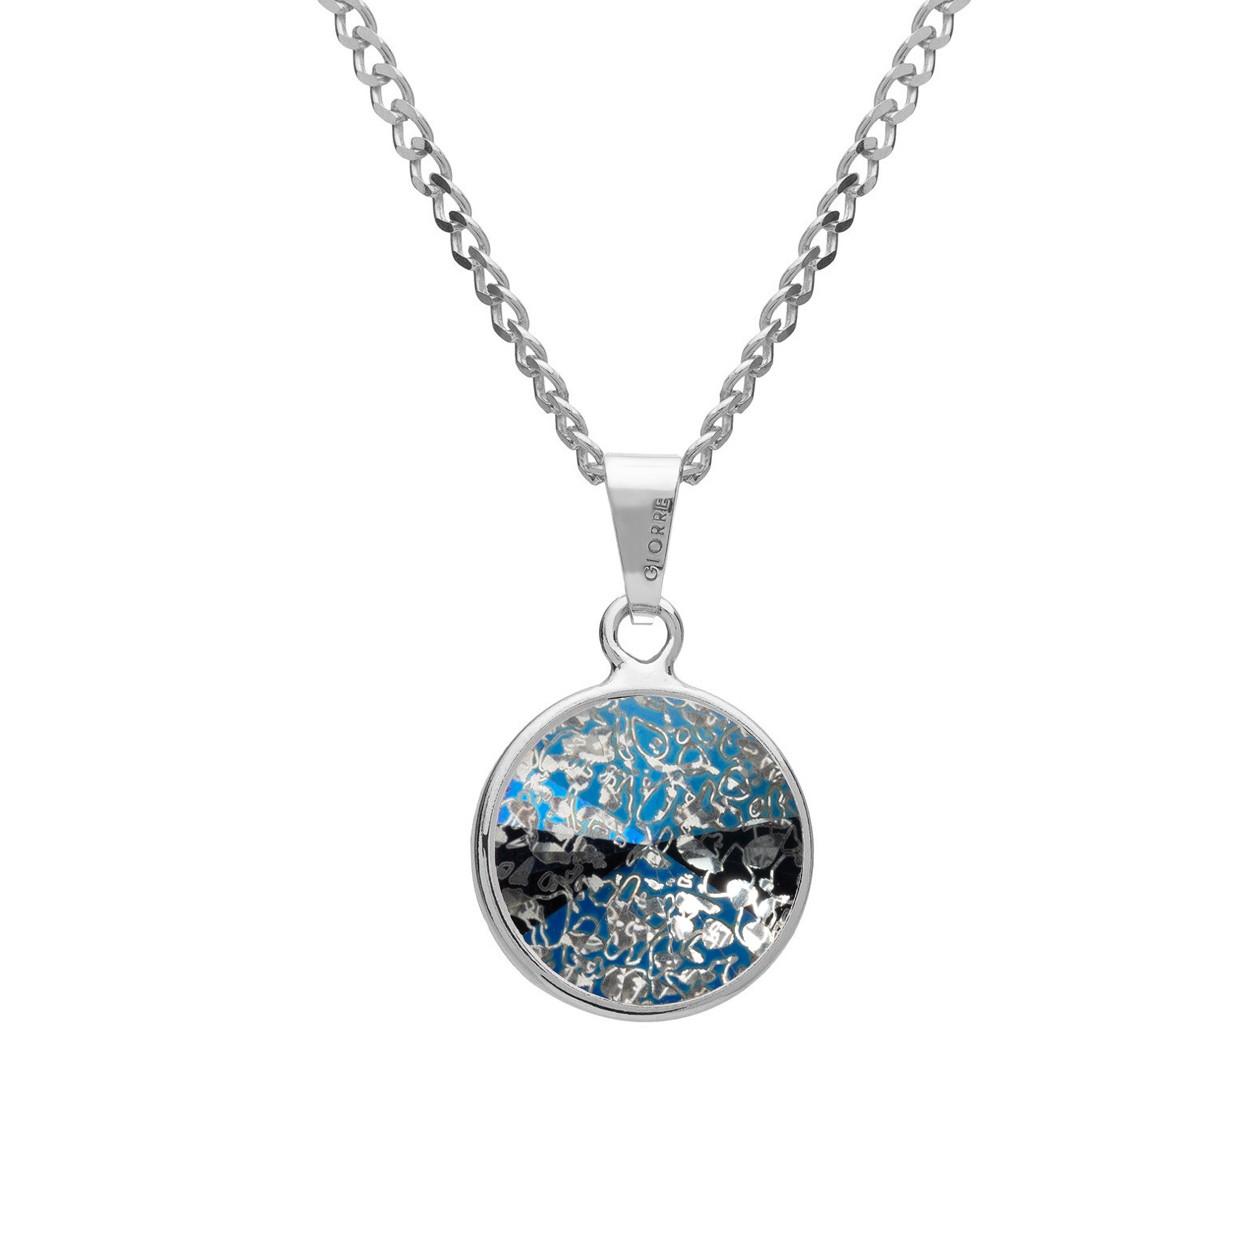 Srebrny naszyjnik z kryształem Gavbari, srebro 925